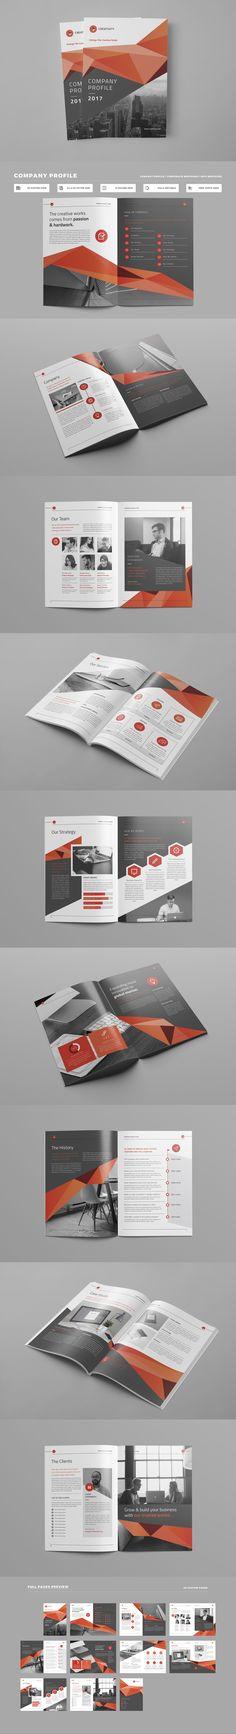 Company Profile - professional business profile template